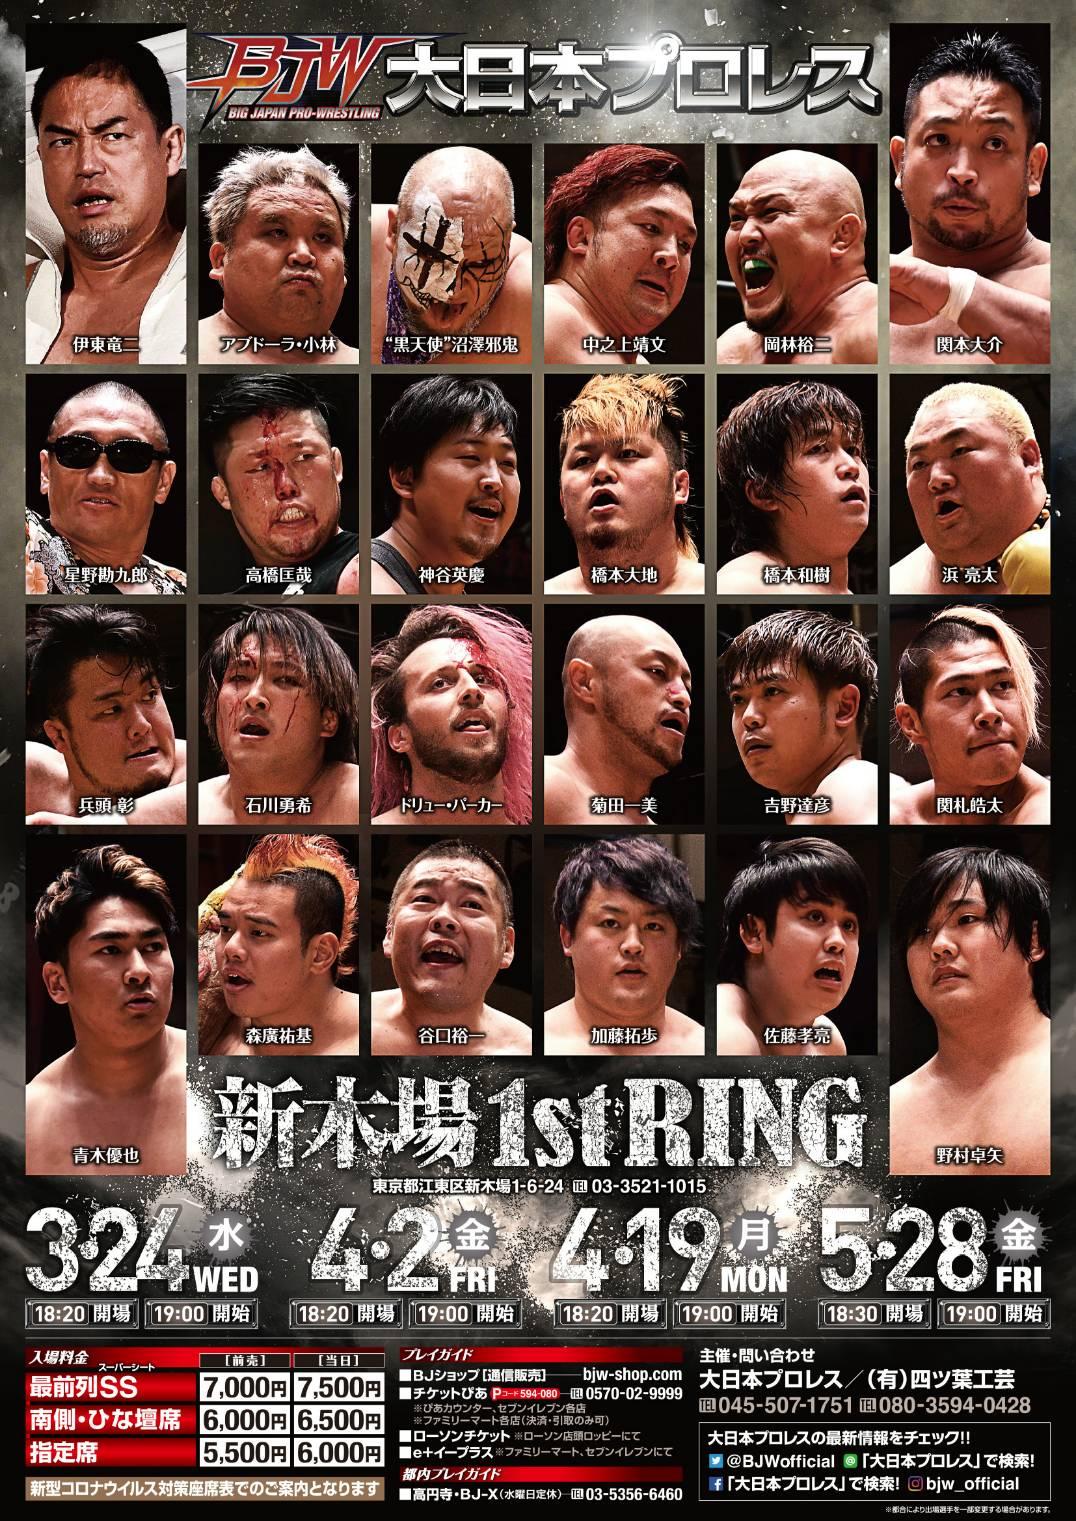 「一騎当千DeathMatch Survivor~C&Dブロック開幕戦」東京・新木場1stRING大会